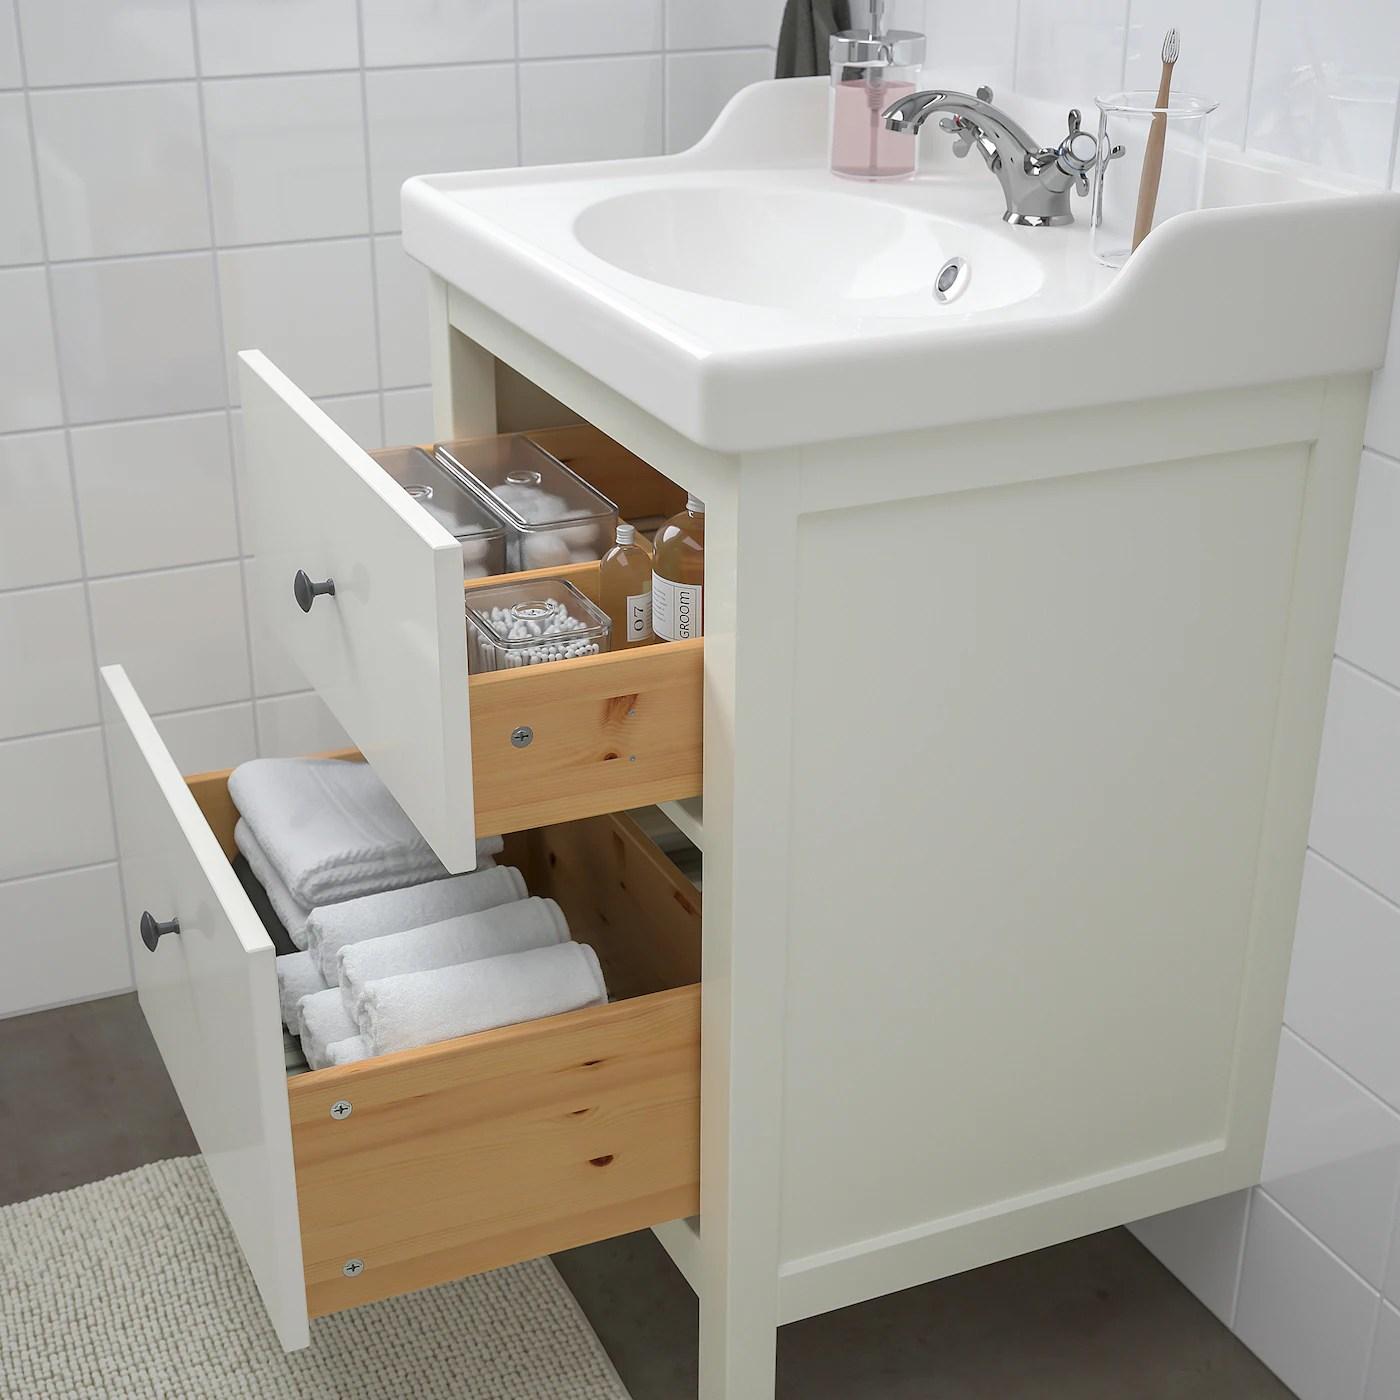 Hemnes Rattviken Mobilier Salle De Bain 4 Pieces Blanc Runskar Mitigeur Lavabo Ikea